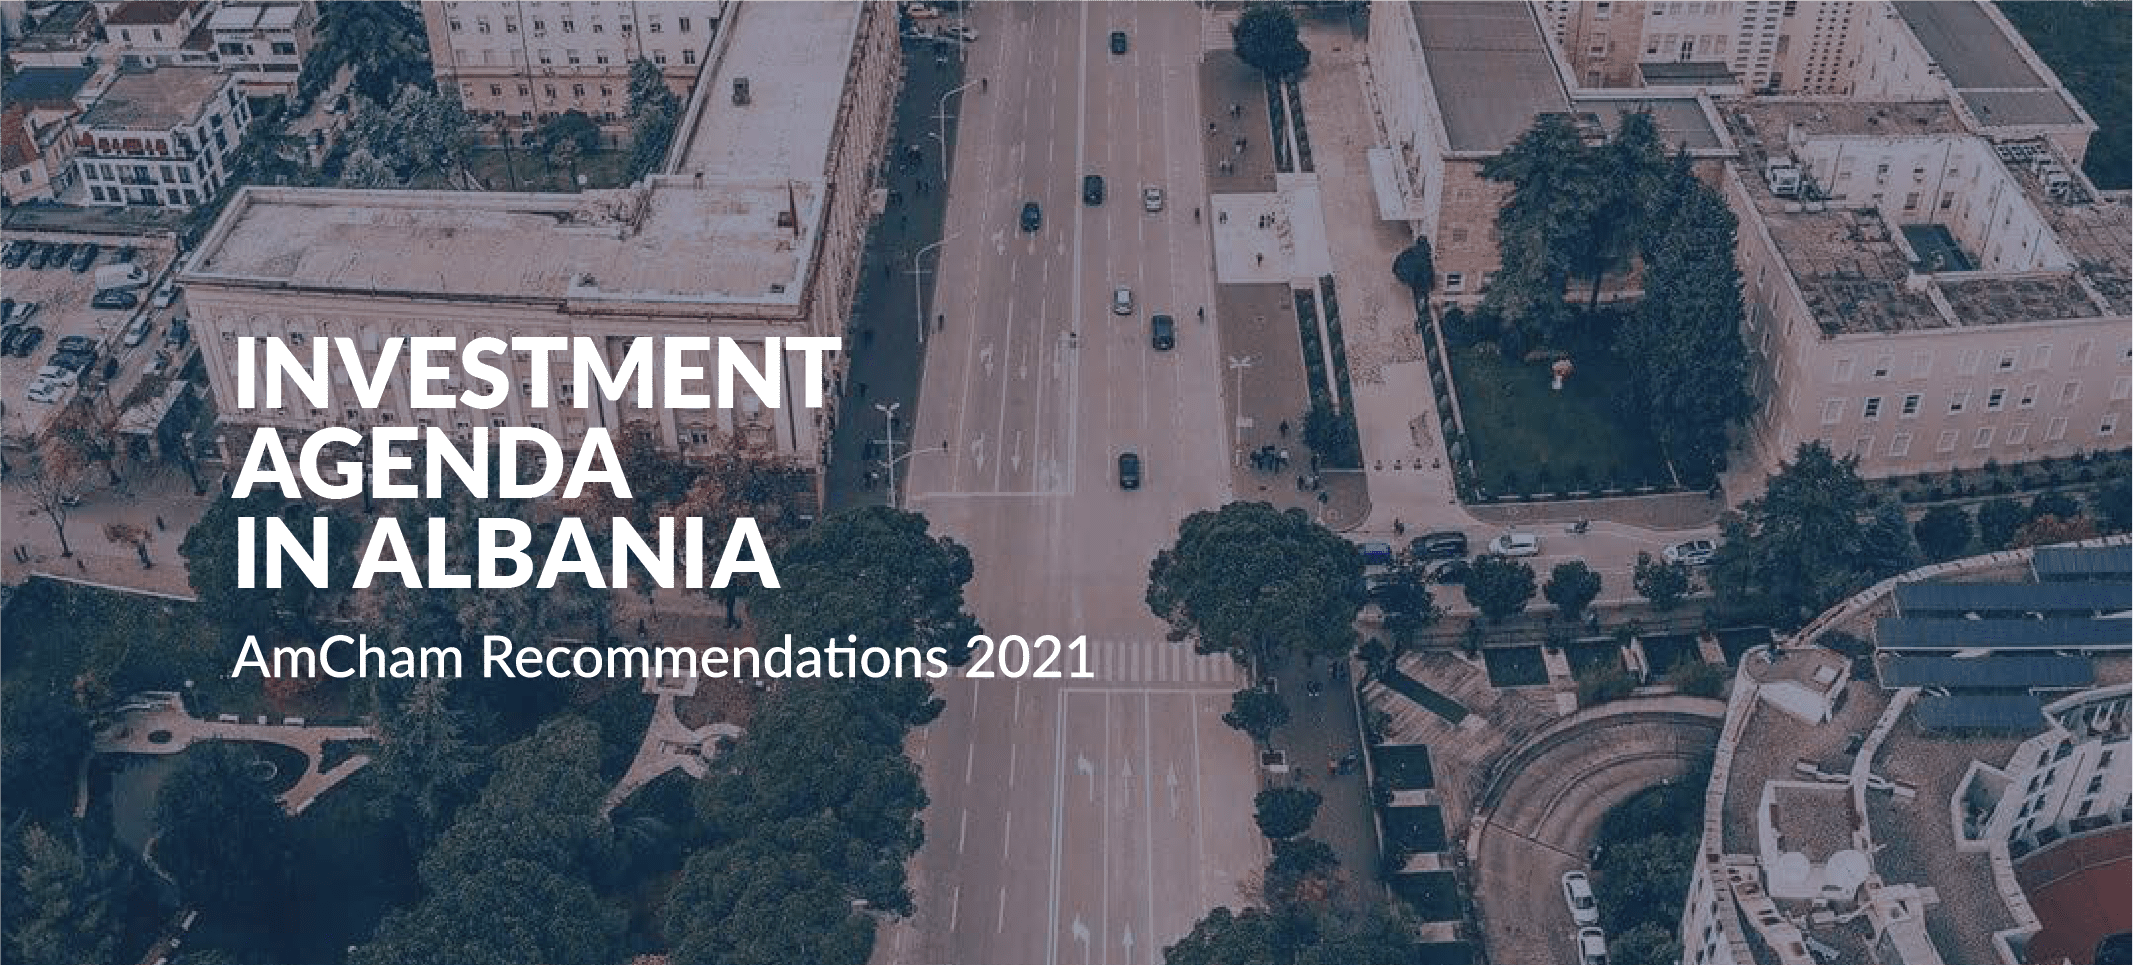 Axhenda e Investimeve 2021